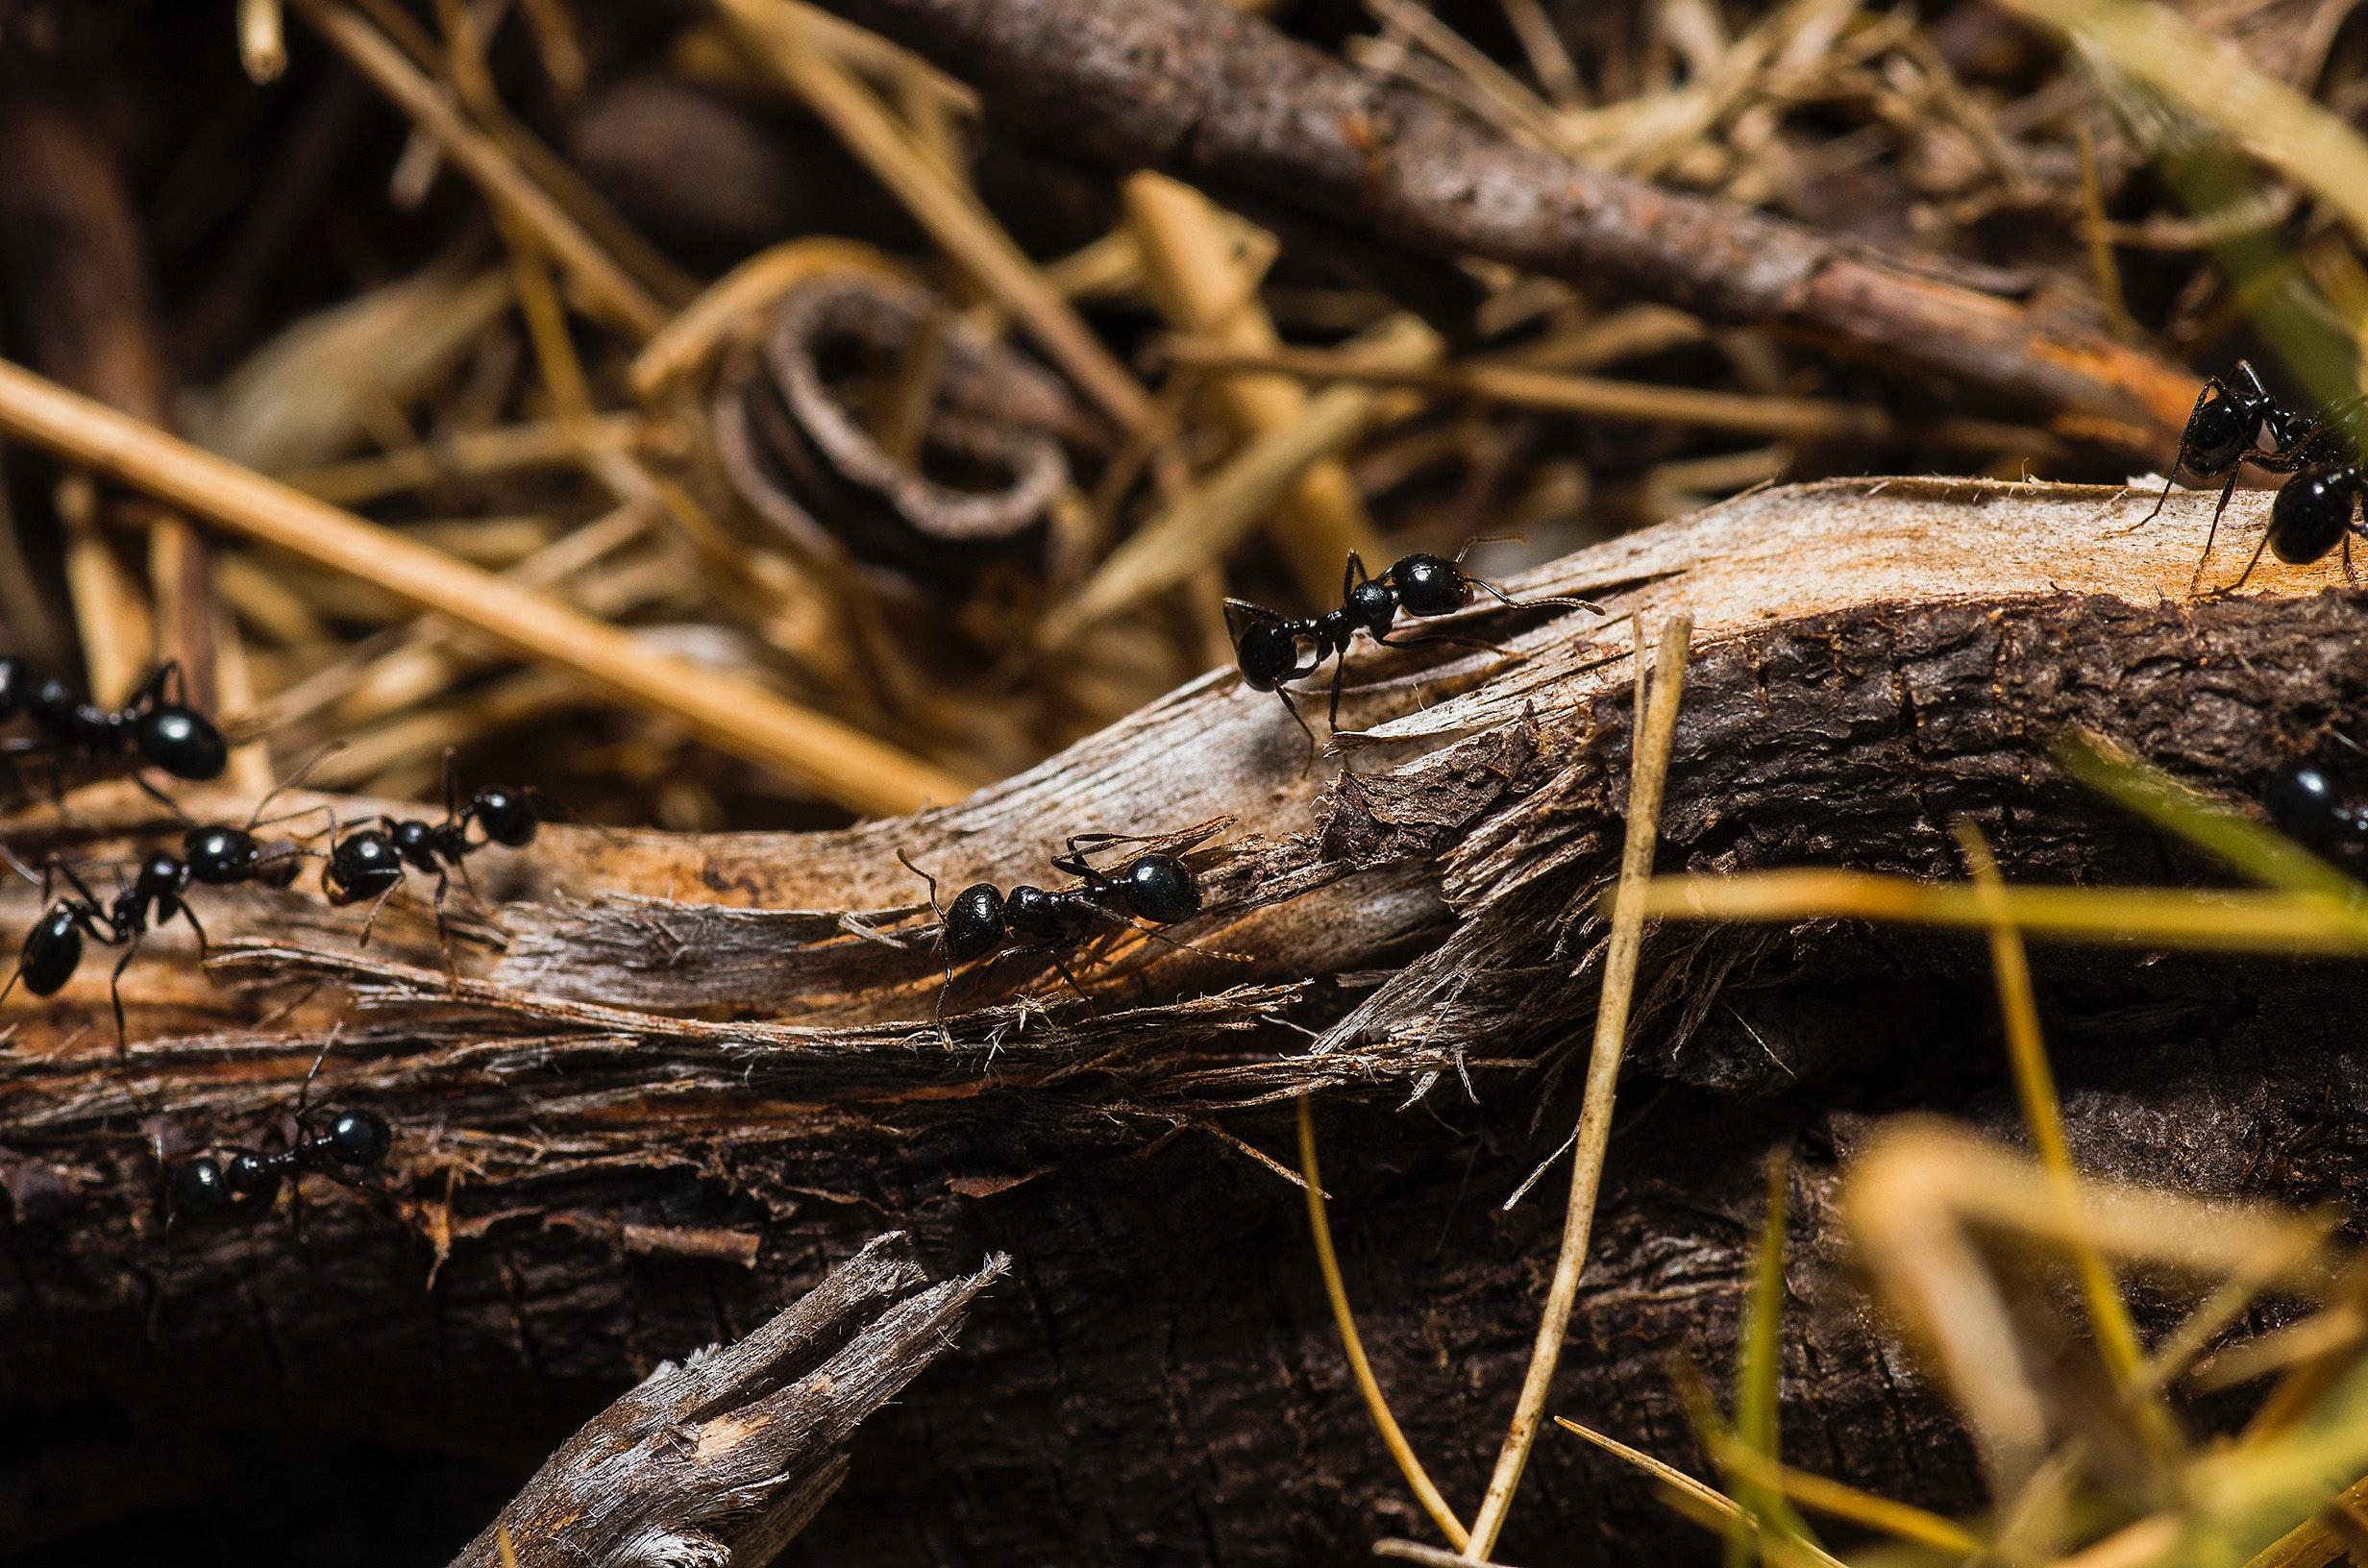 Black Ants on Brown Tree Trunks, Animal, Macro photography, Wildlife, Wild, HQ Photo